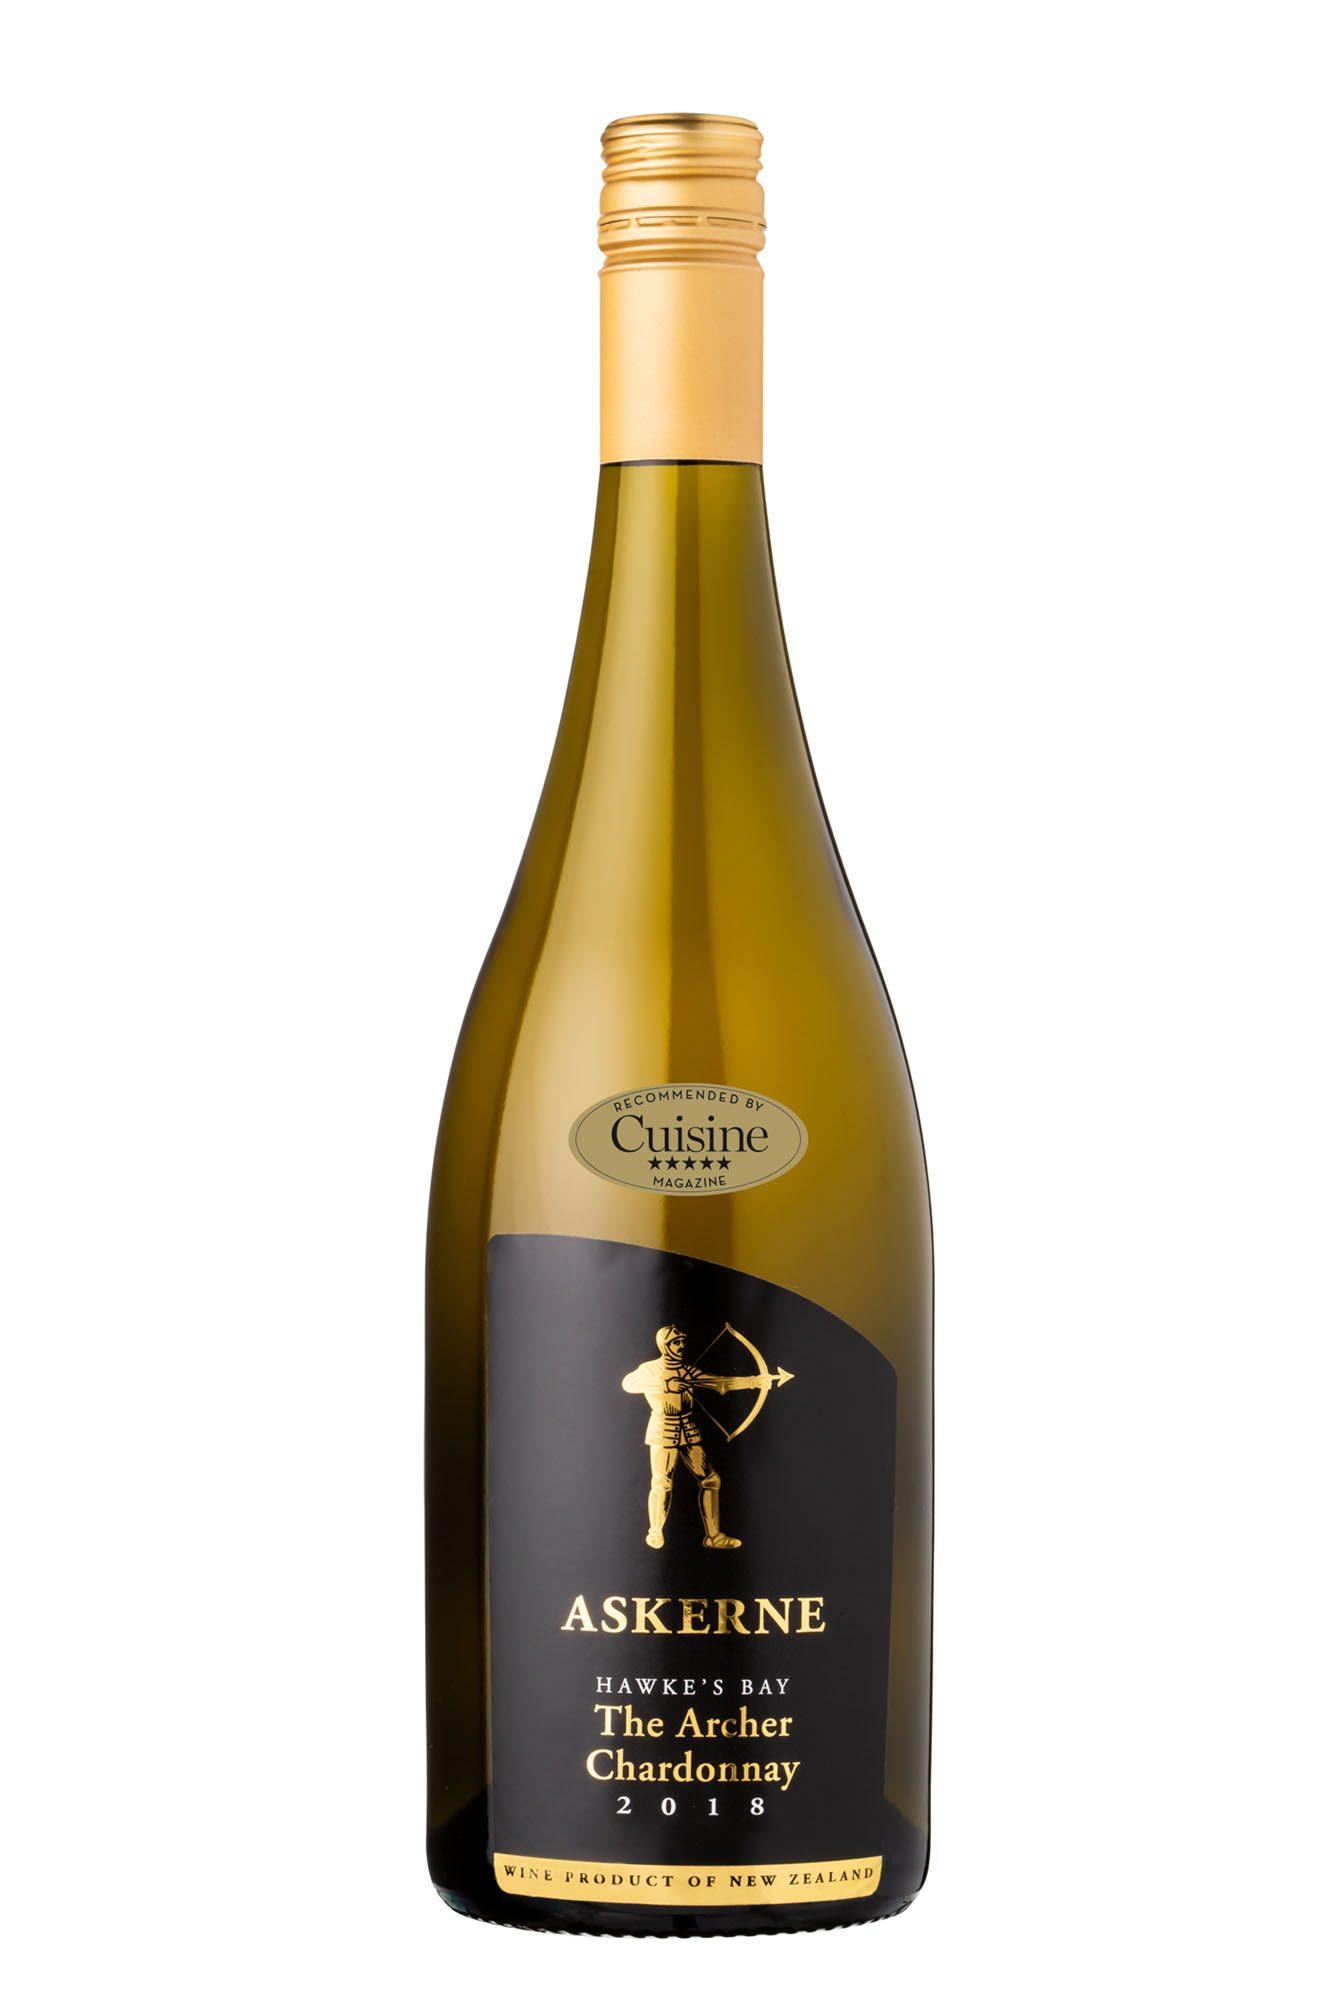 Askerne 'The Archer' Chardonnay 2018 (Hawke's Bay)